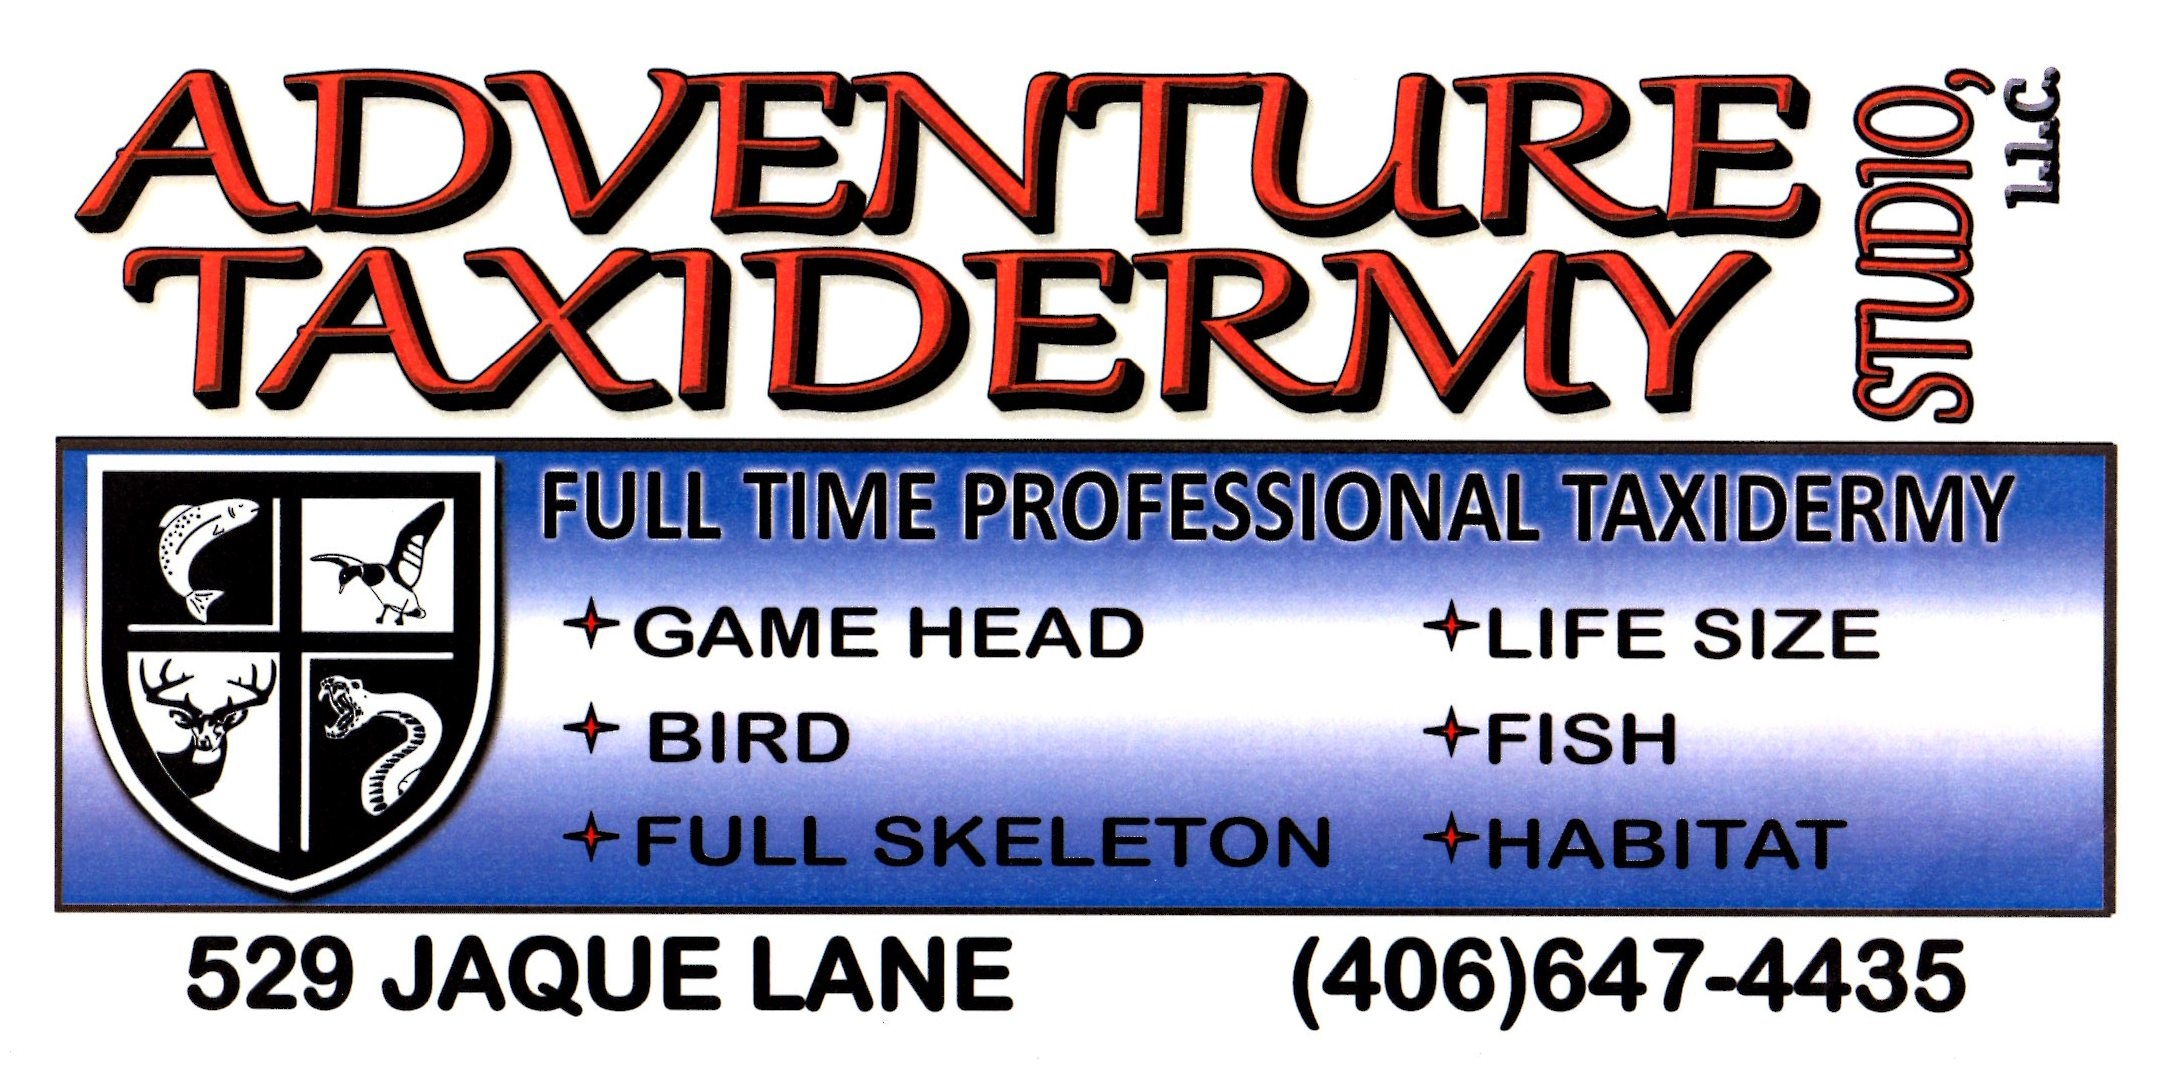 Adventure Taxidermy Studio, L.L.C. image 0